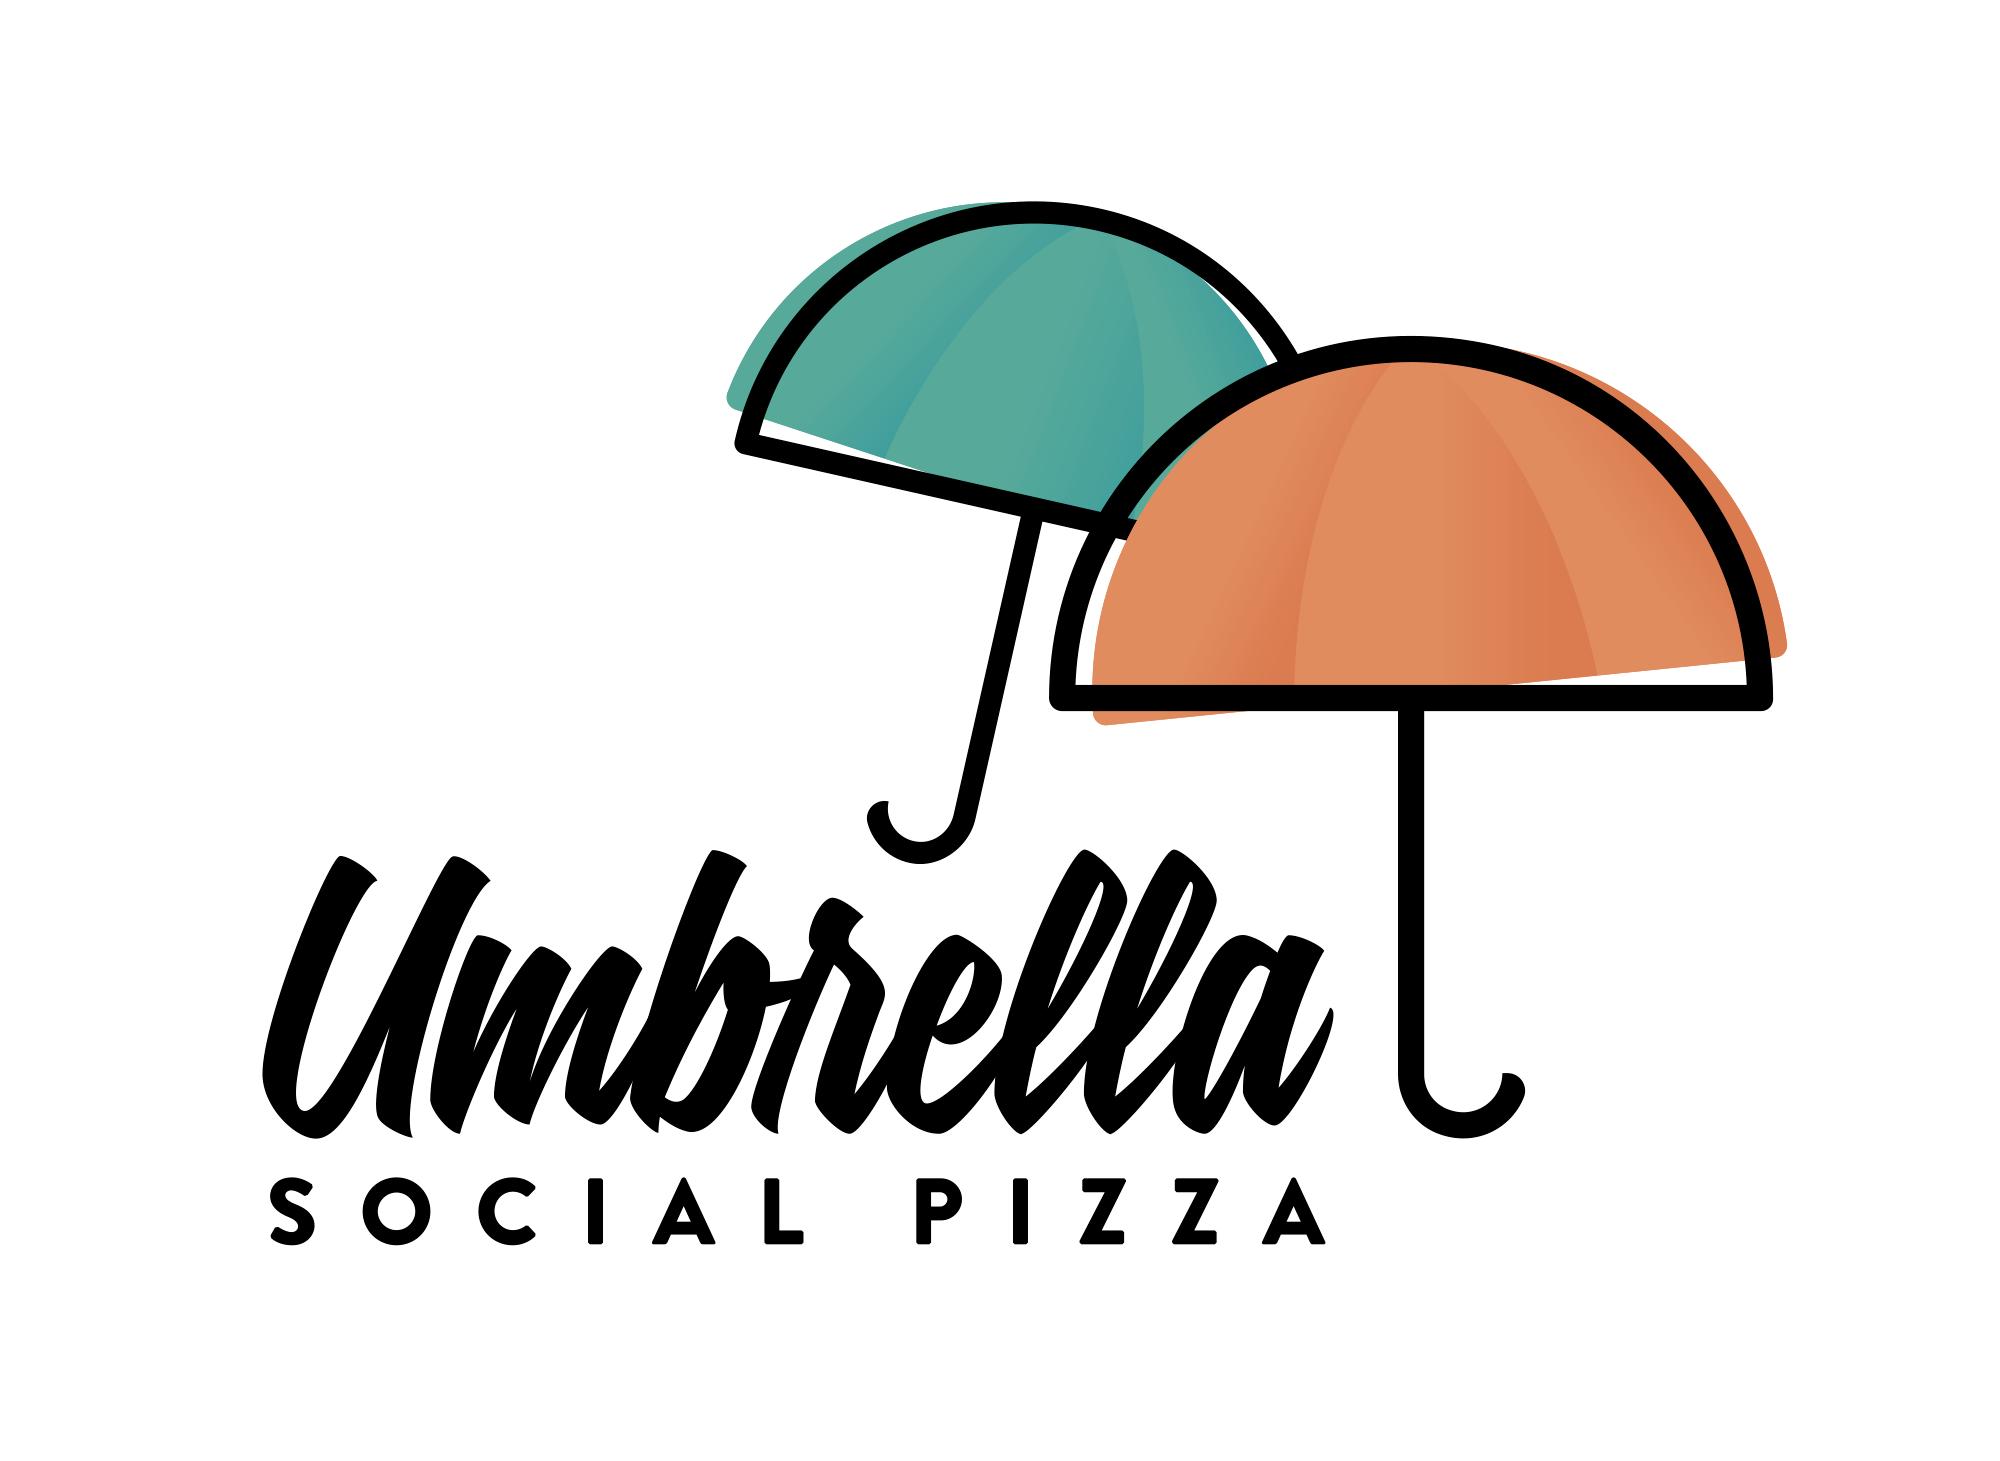 umbrella-social-pizza-clientes-agencia-diretriz-digital-marketing-fortaleza